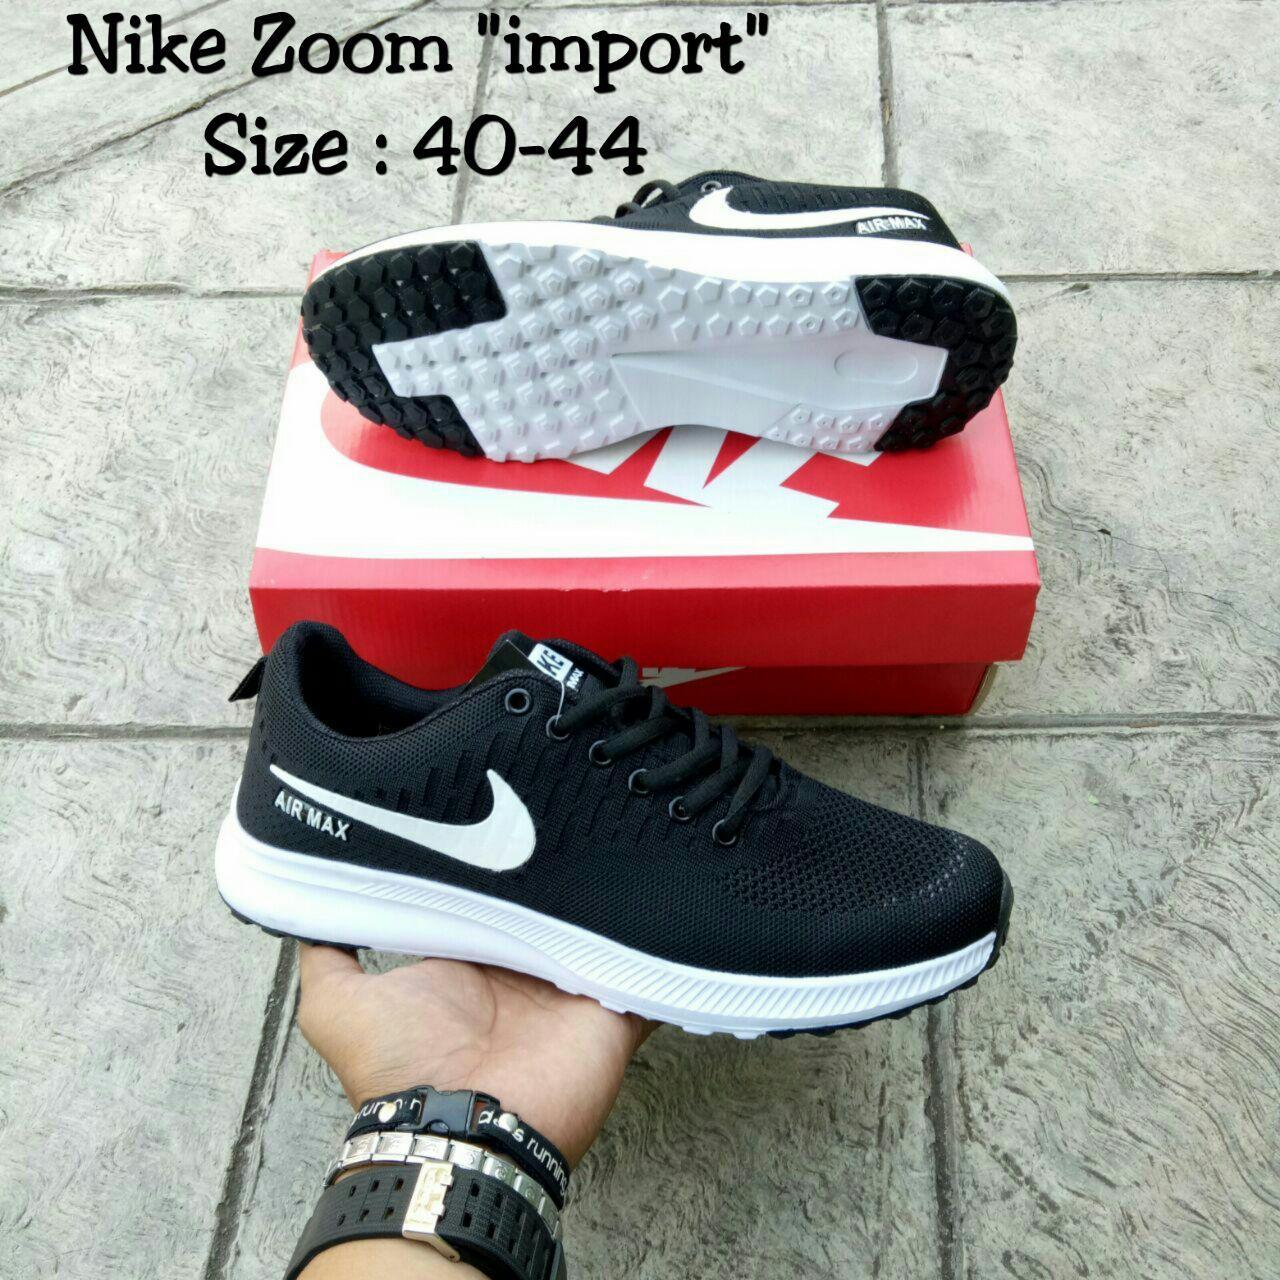 Nike Zoom Airmax Black White